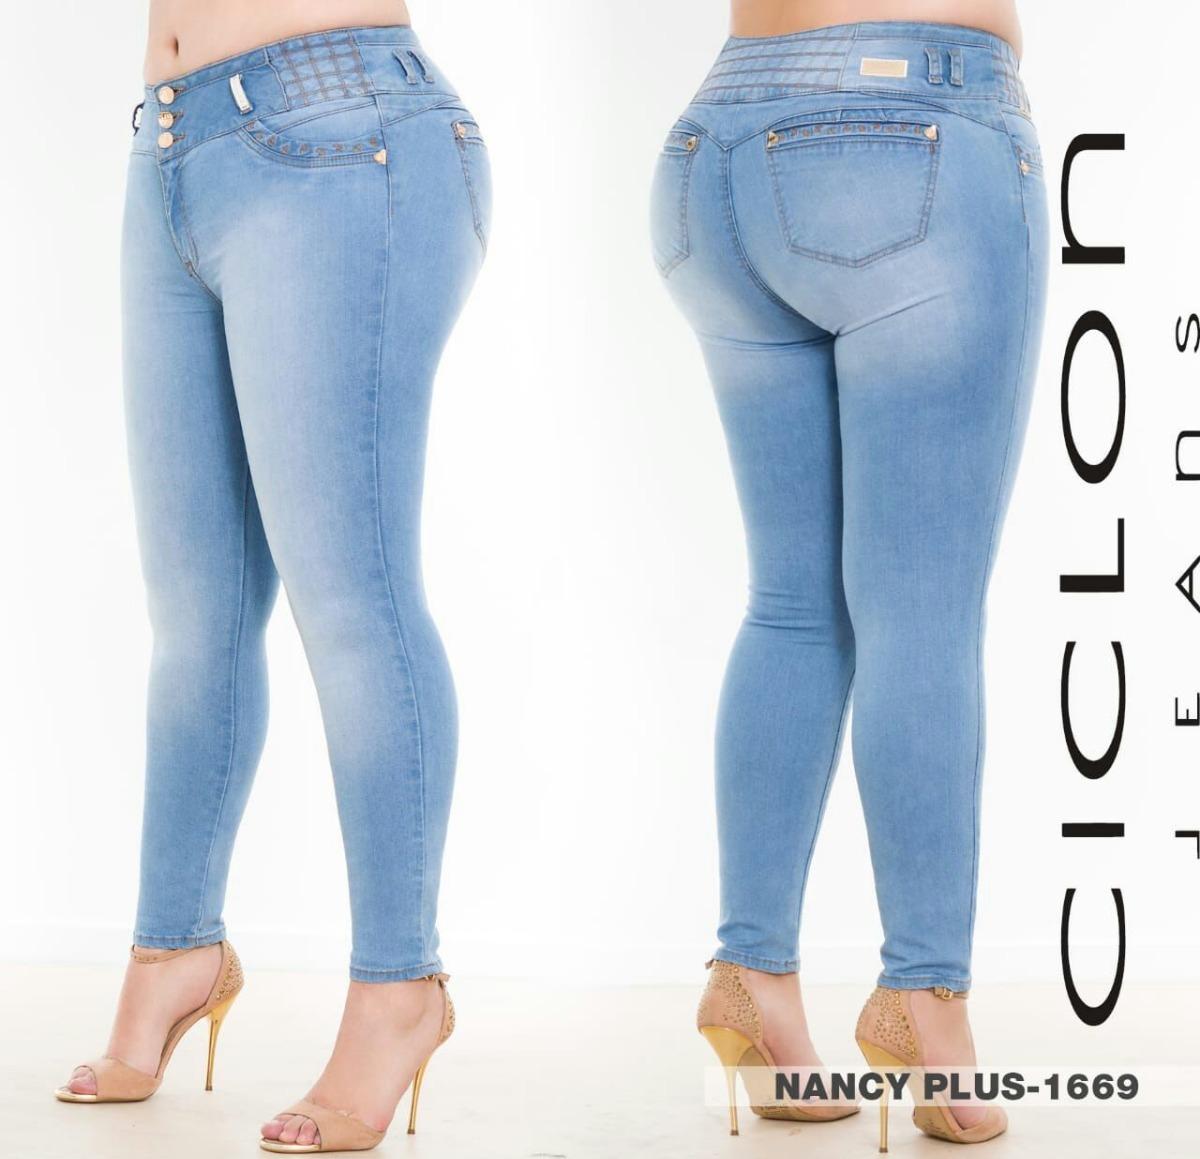 c6b6a0ee3b jeans ciclon pantalón mujer corte colombiano talla extra d. Cargando zoom.